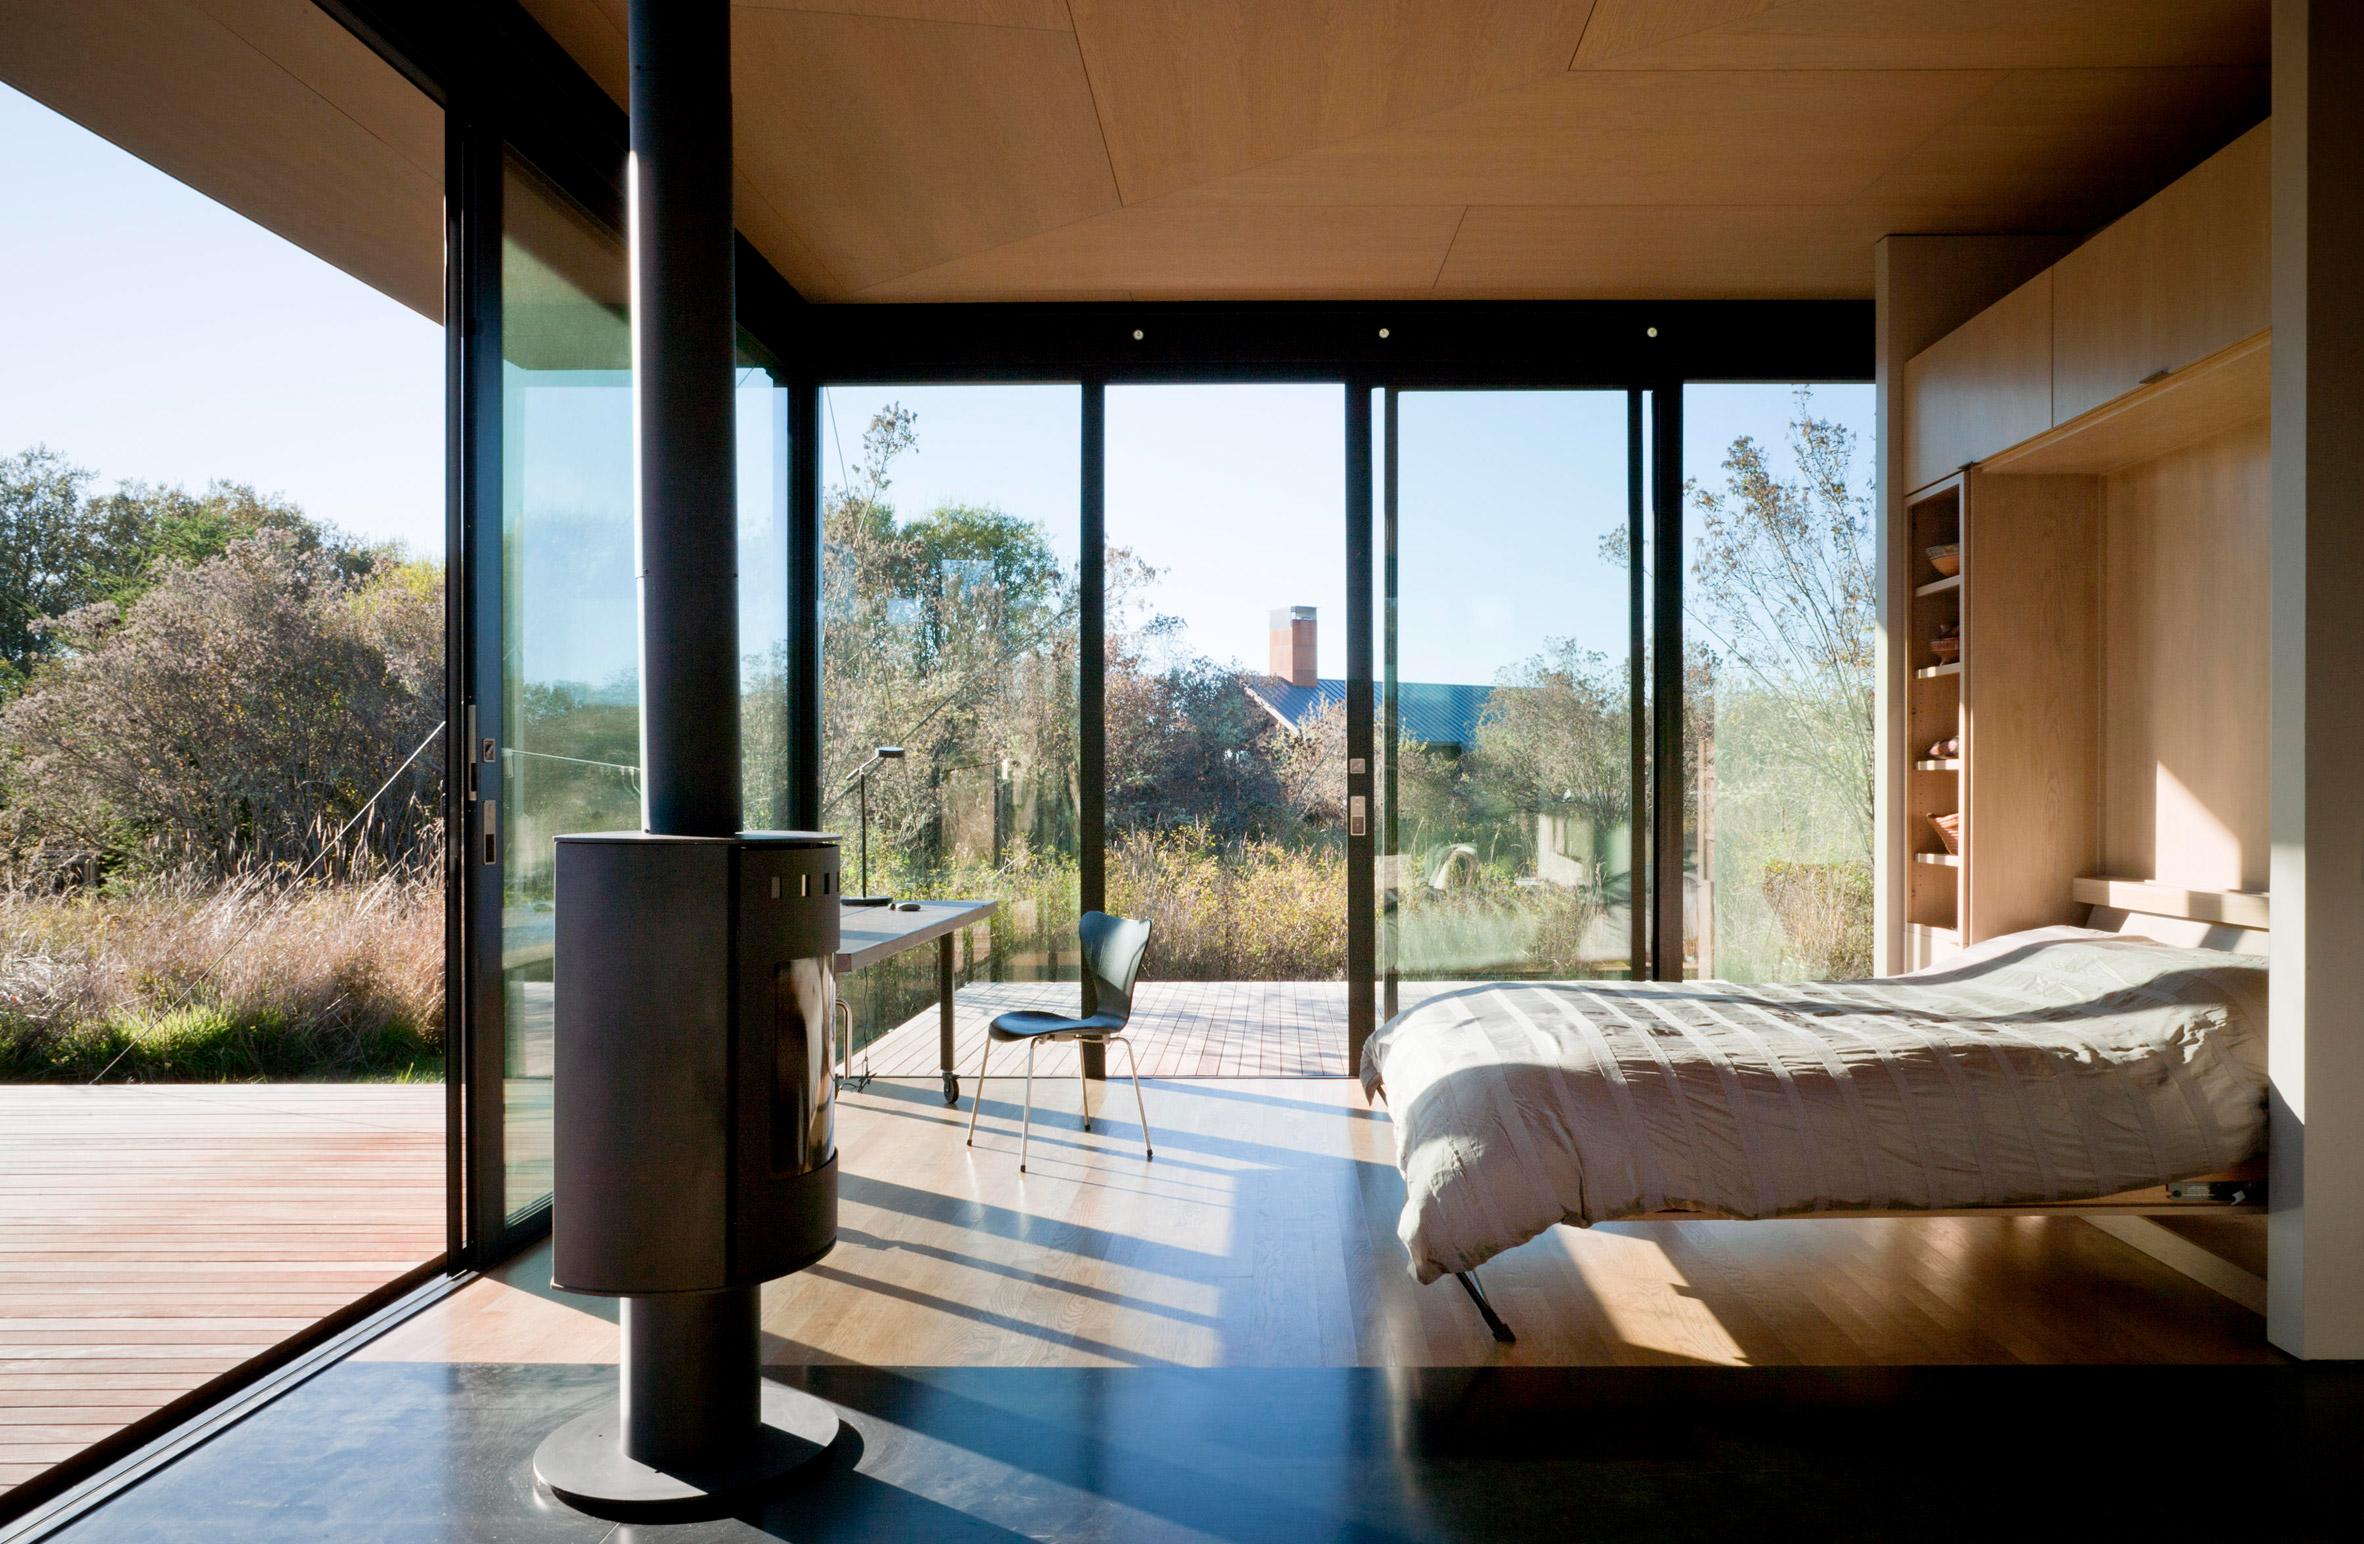 Bed folds down inside False Bay Writer's Cabin by Olson Kundig